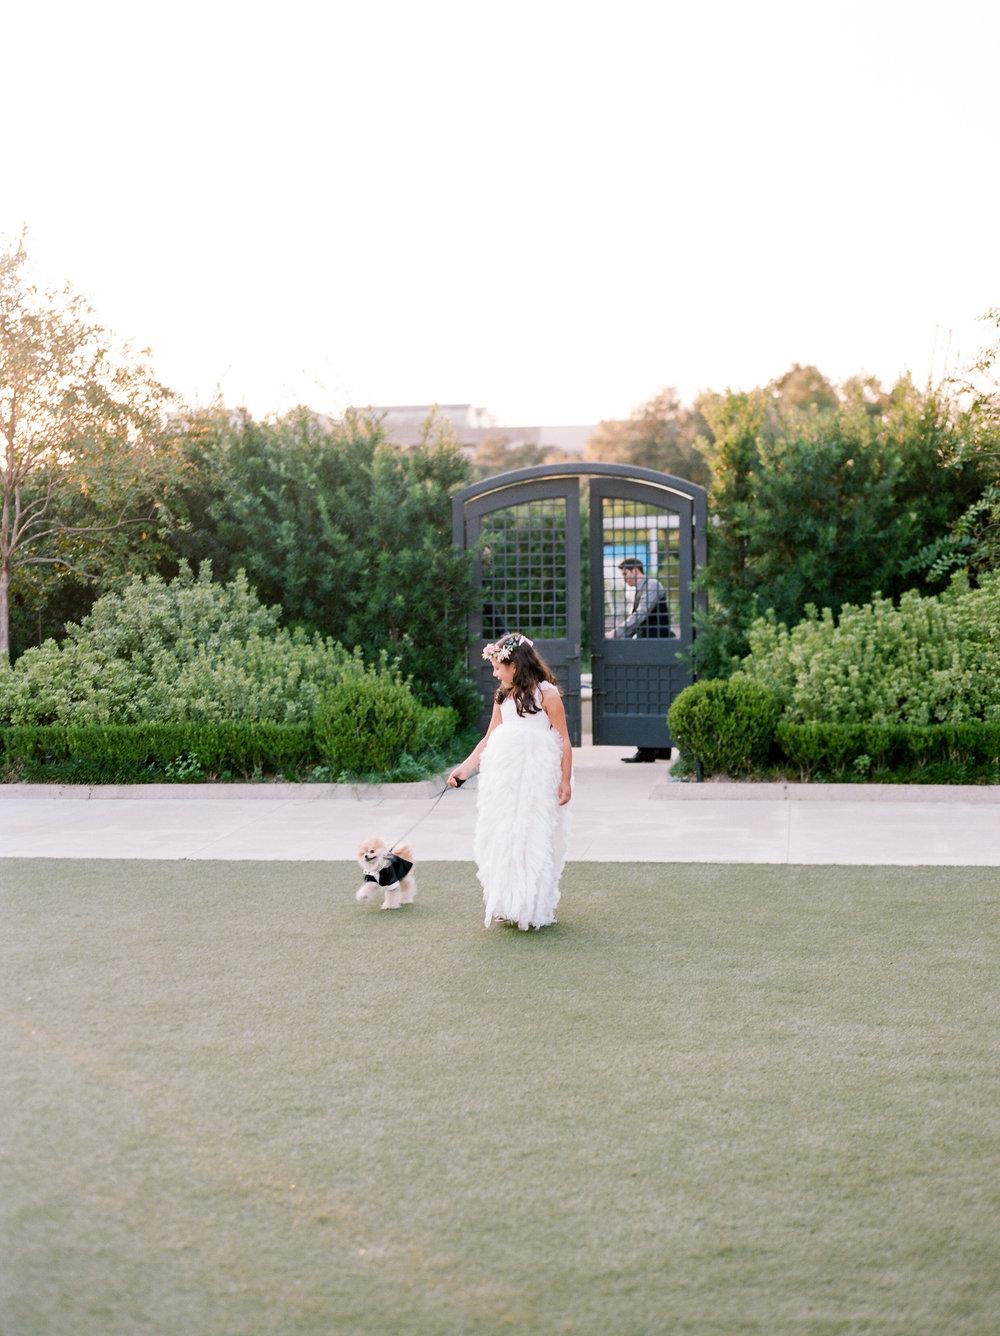 Martha-Stewart-Wedding-Dana-Fernandez-Photography-Josh-Texas-Film-Houston-Wedding-Fine-Art-Photographer-McGovern-Centennial-Gardens-Top-Best-29.jpg